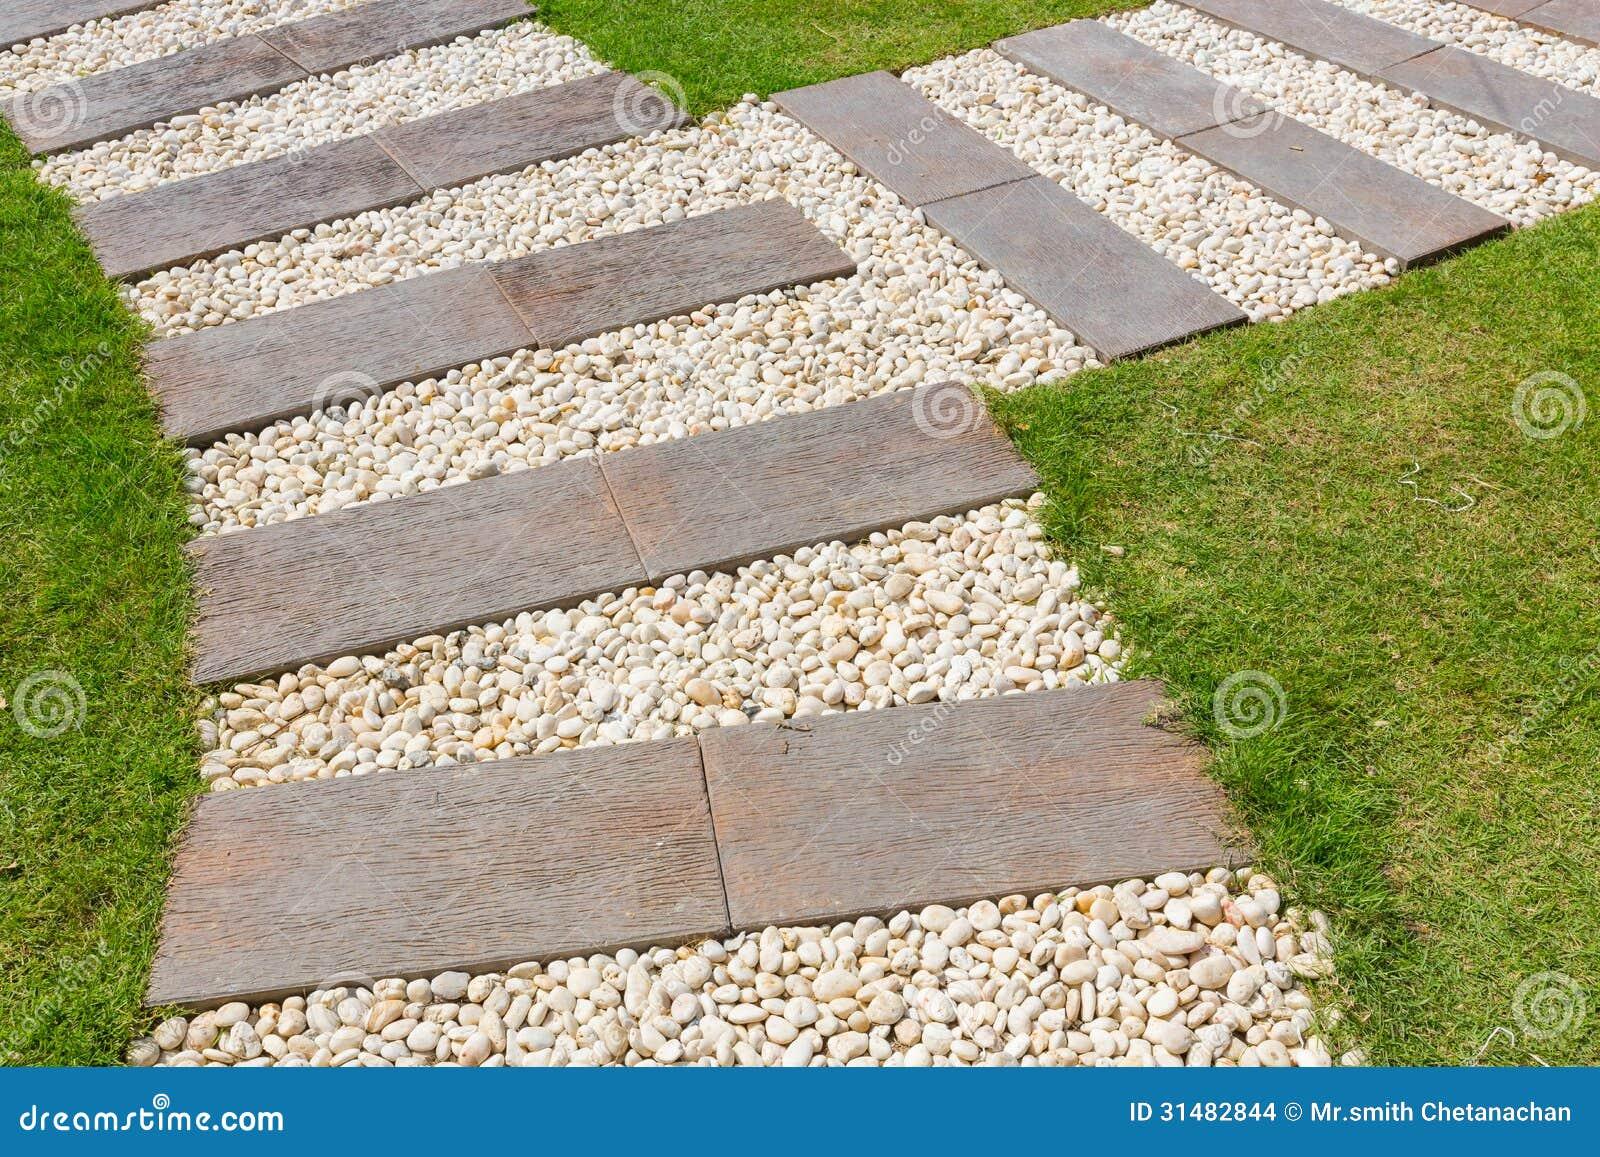 Imagens de #4B6613 banco de jardim vetor:Steinweg Im Garten Stockbilder – Bild  1300x957 px 3592 Barra Banheiro Idoso